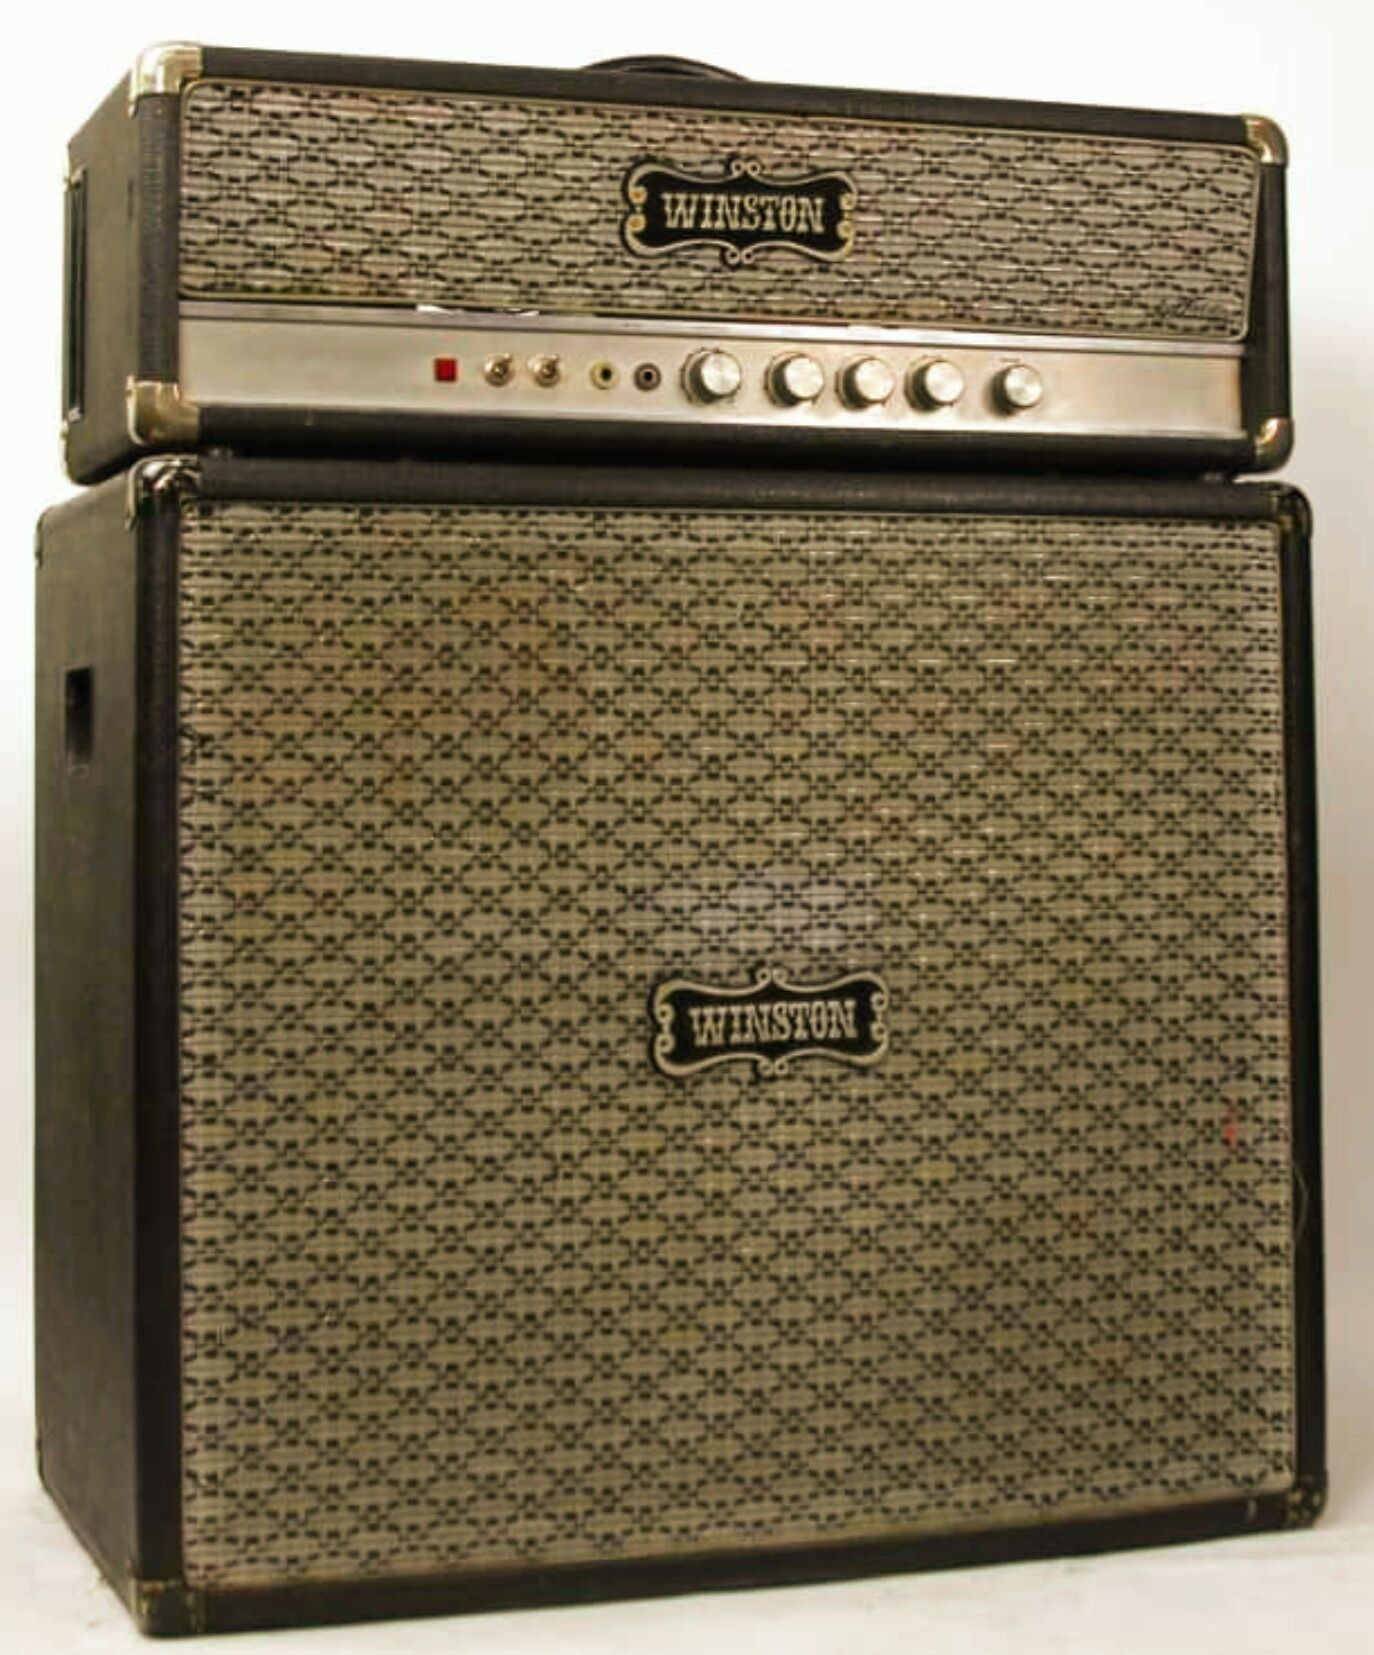 medium resolution of 1970 winston ba 200 made by echolette de germanium ss pre amp w four el34 two 85 watt 12inch fane speakers great early hiwatt sound save schematic